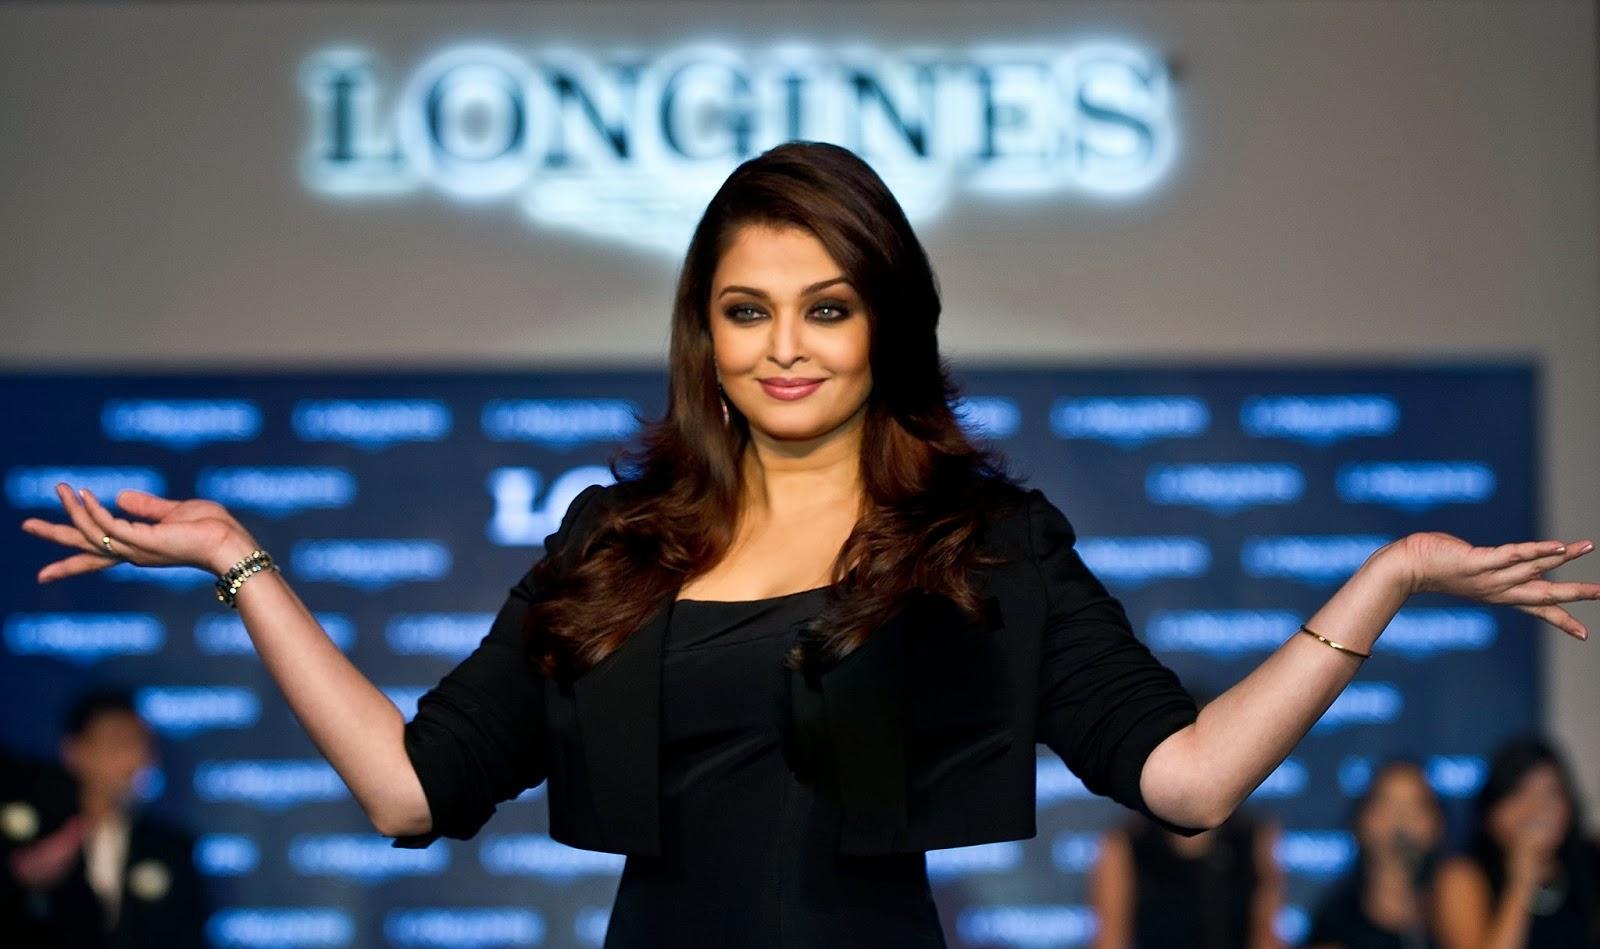 Aishwarya Rai, Bollywood, Bollywood actress, Entertainment, Kaanchi, Mishti, Mishti Photo, Movies, Salman Khan and Mishti, Showbiz, Subhash Ghai, Tall,